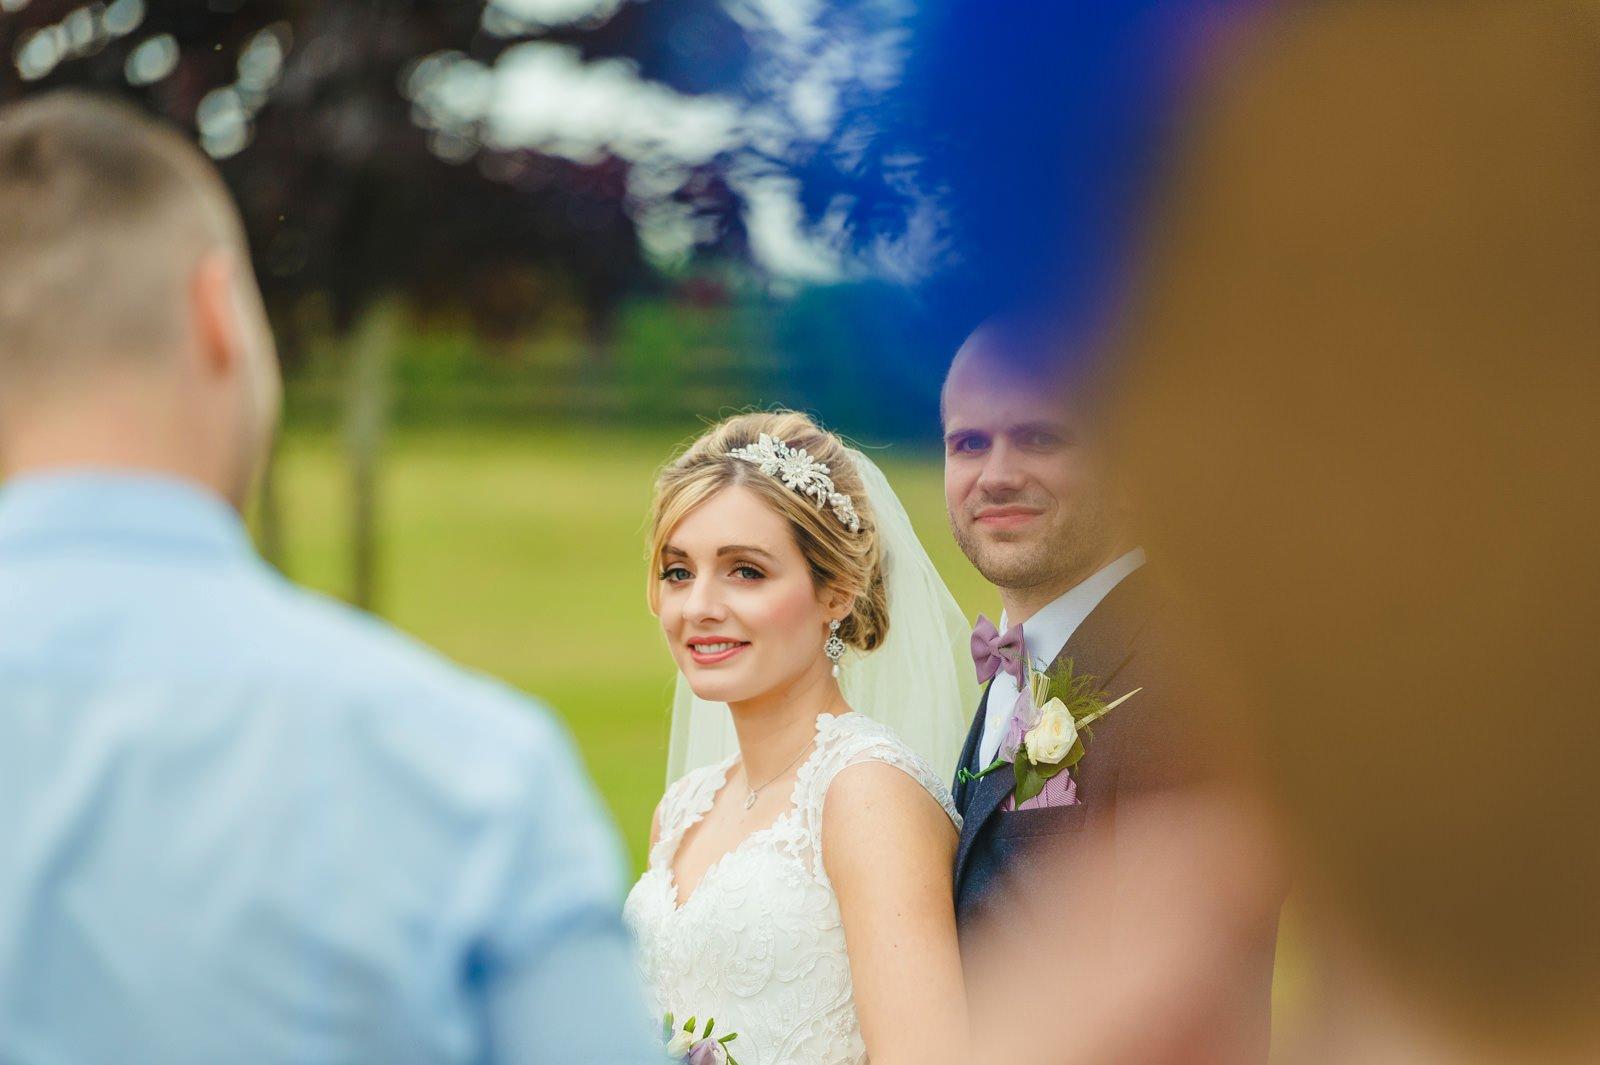 Millers Of Netley wedding, Dorrington, Shrewsbury | Emma + Ben 43